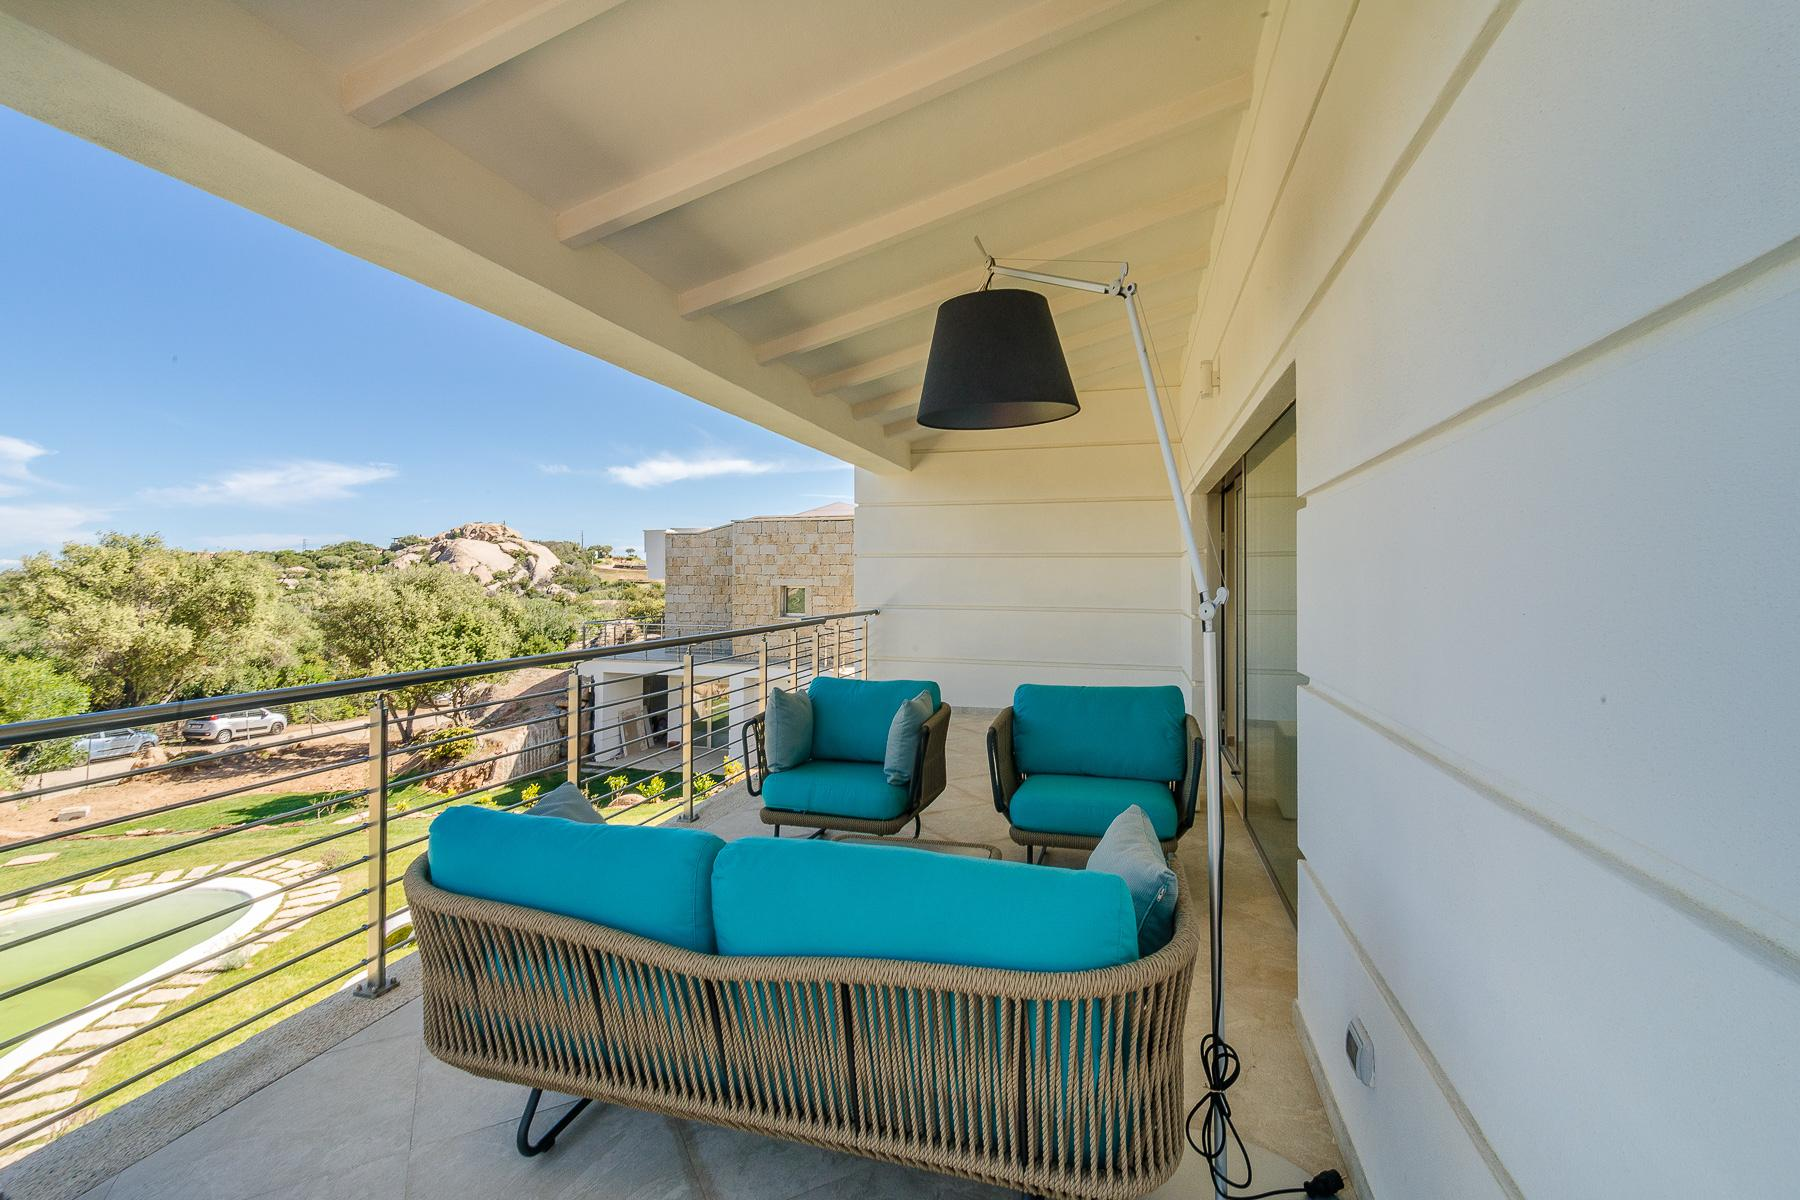 Pegasus Gorgeus Villa with swimming pool immersed in mediterranean fragrances - 2